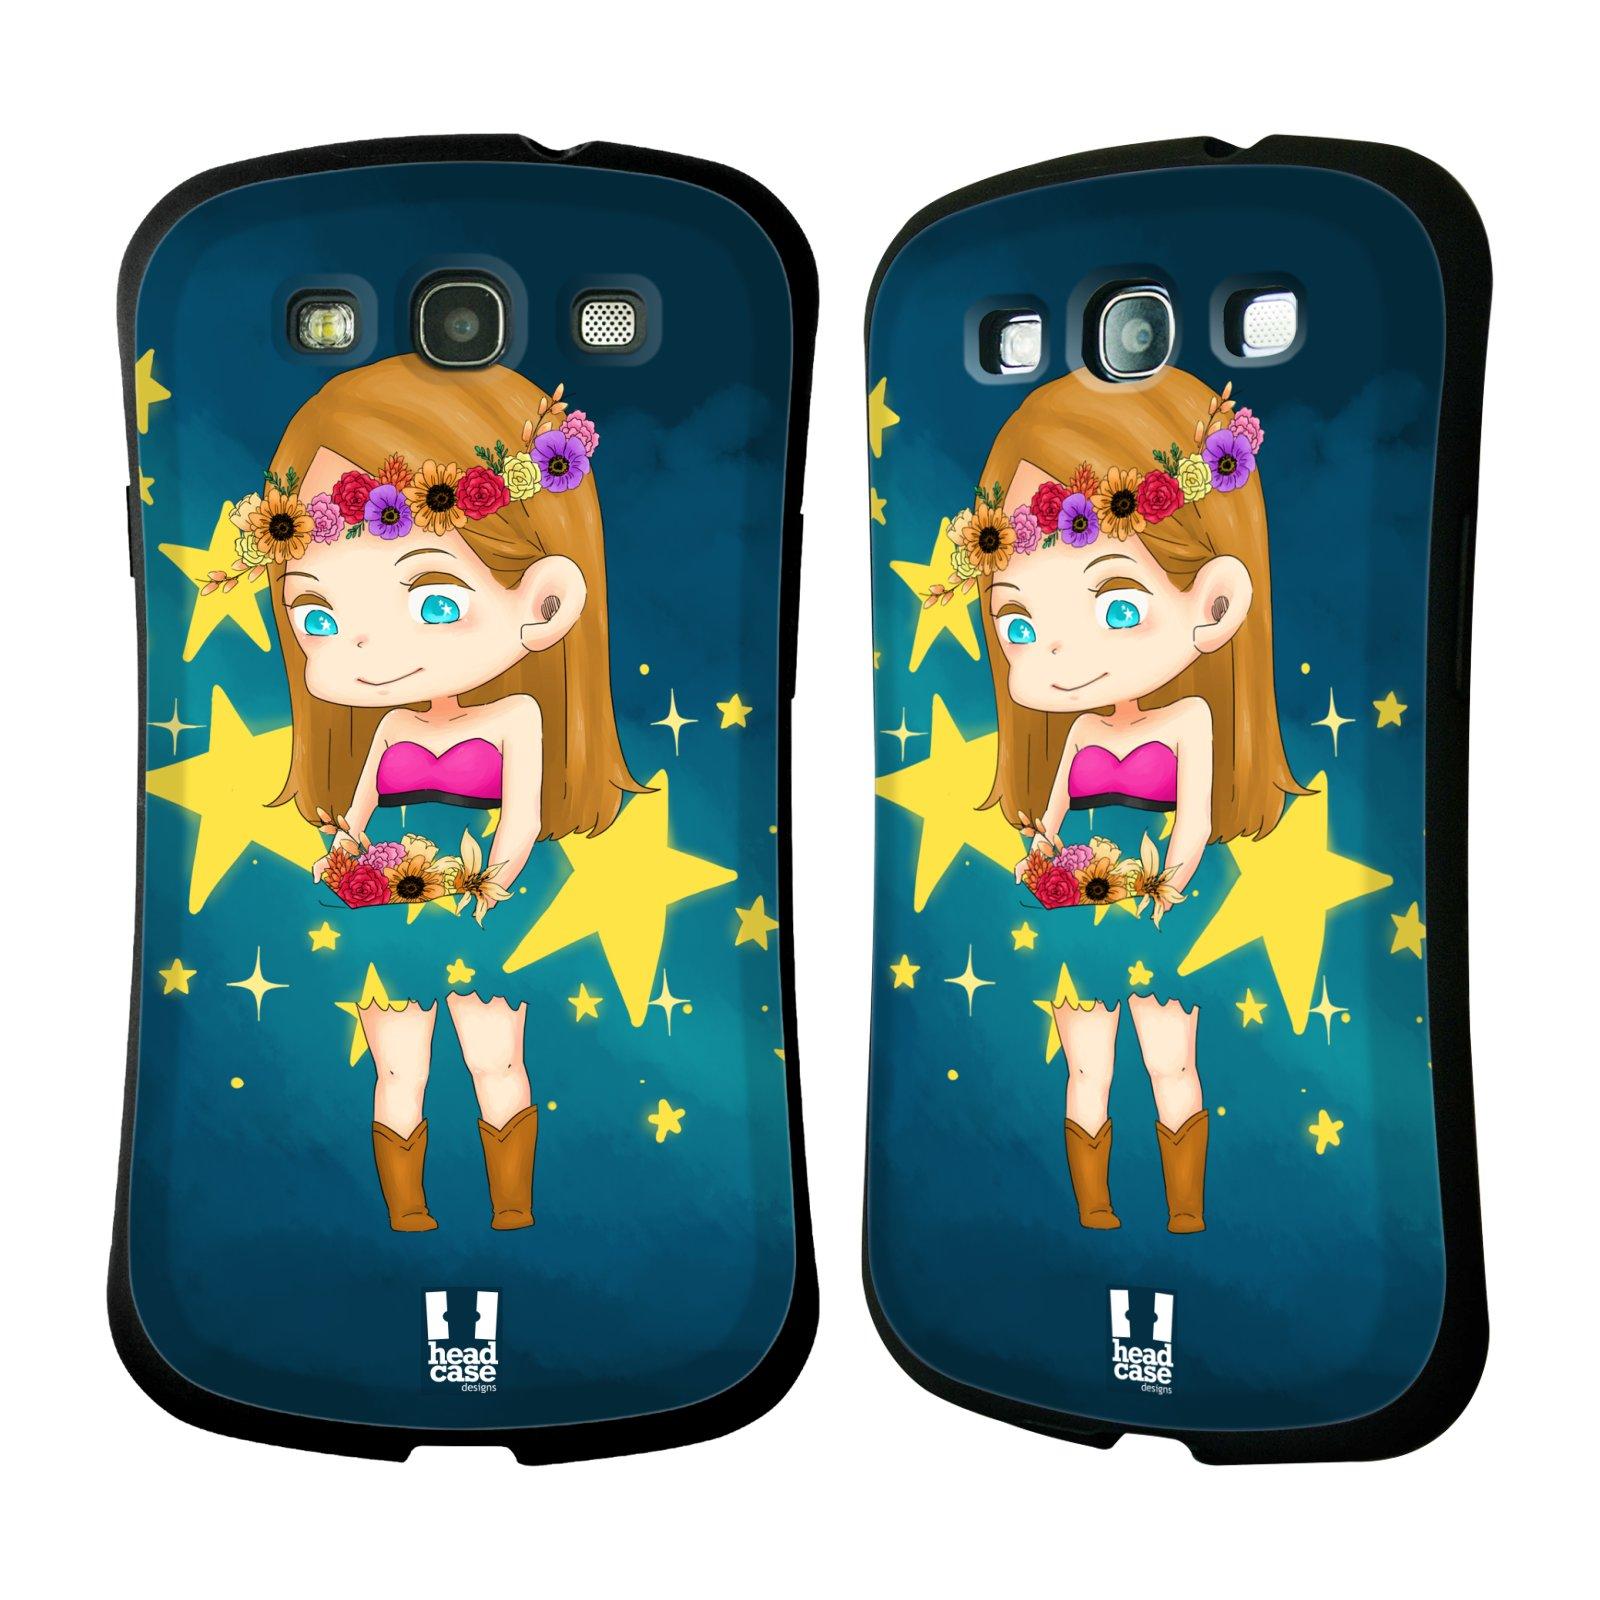 HEAD CASE silikon/plast odolný obal na mobil Samsung Galaxy S3 vzor Kreslené postavičky vesmír zmizení HVĚZDA